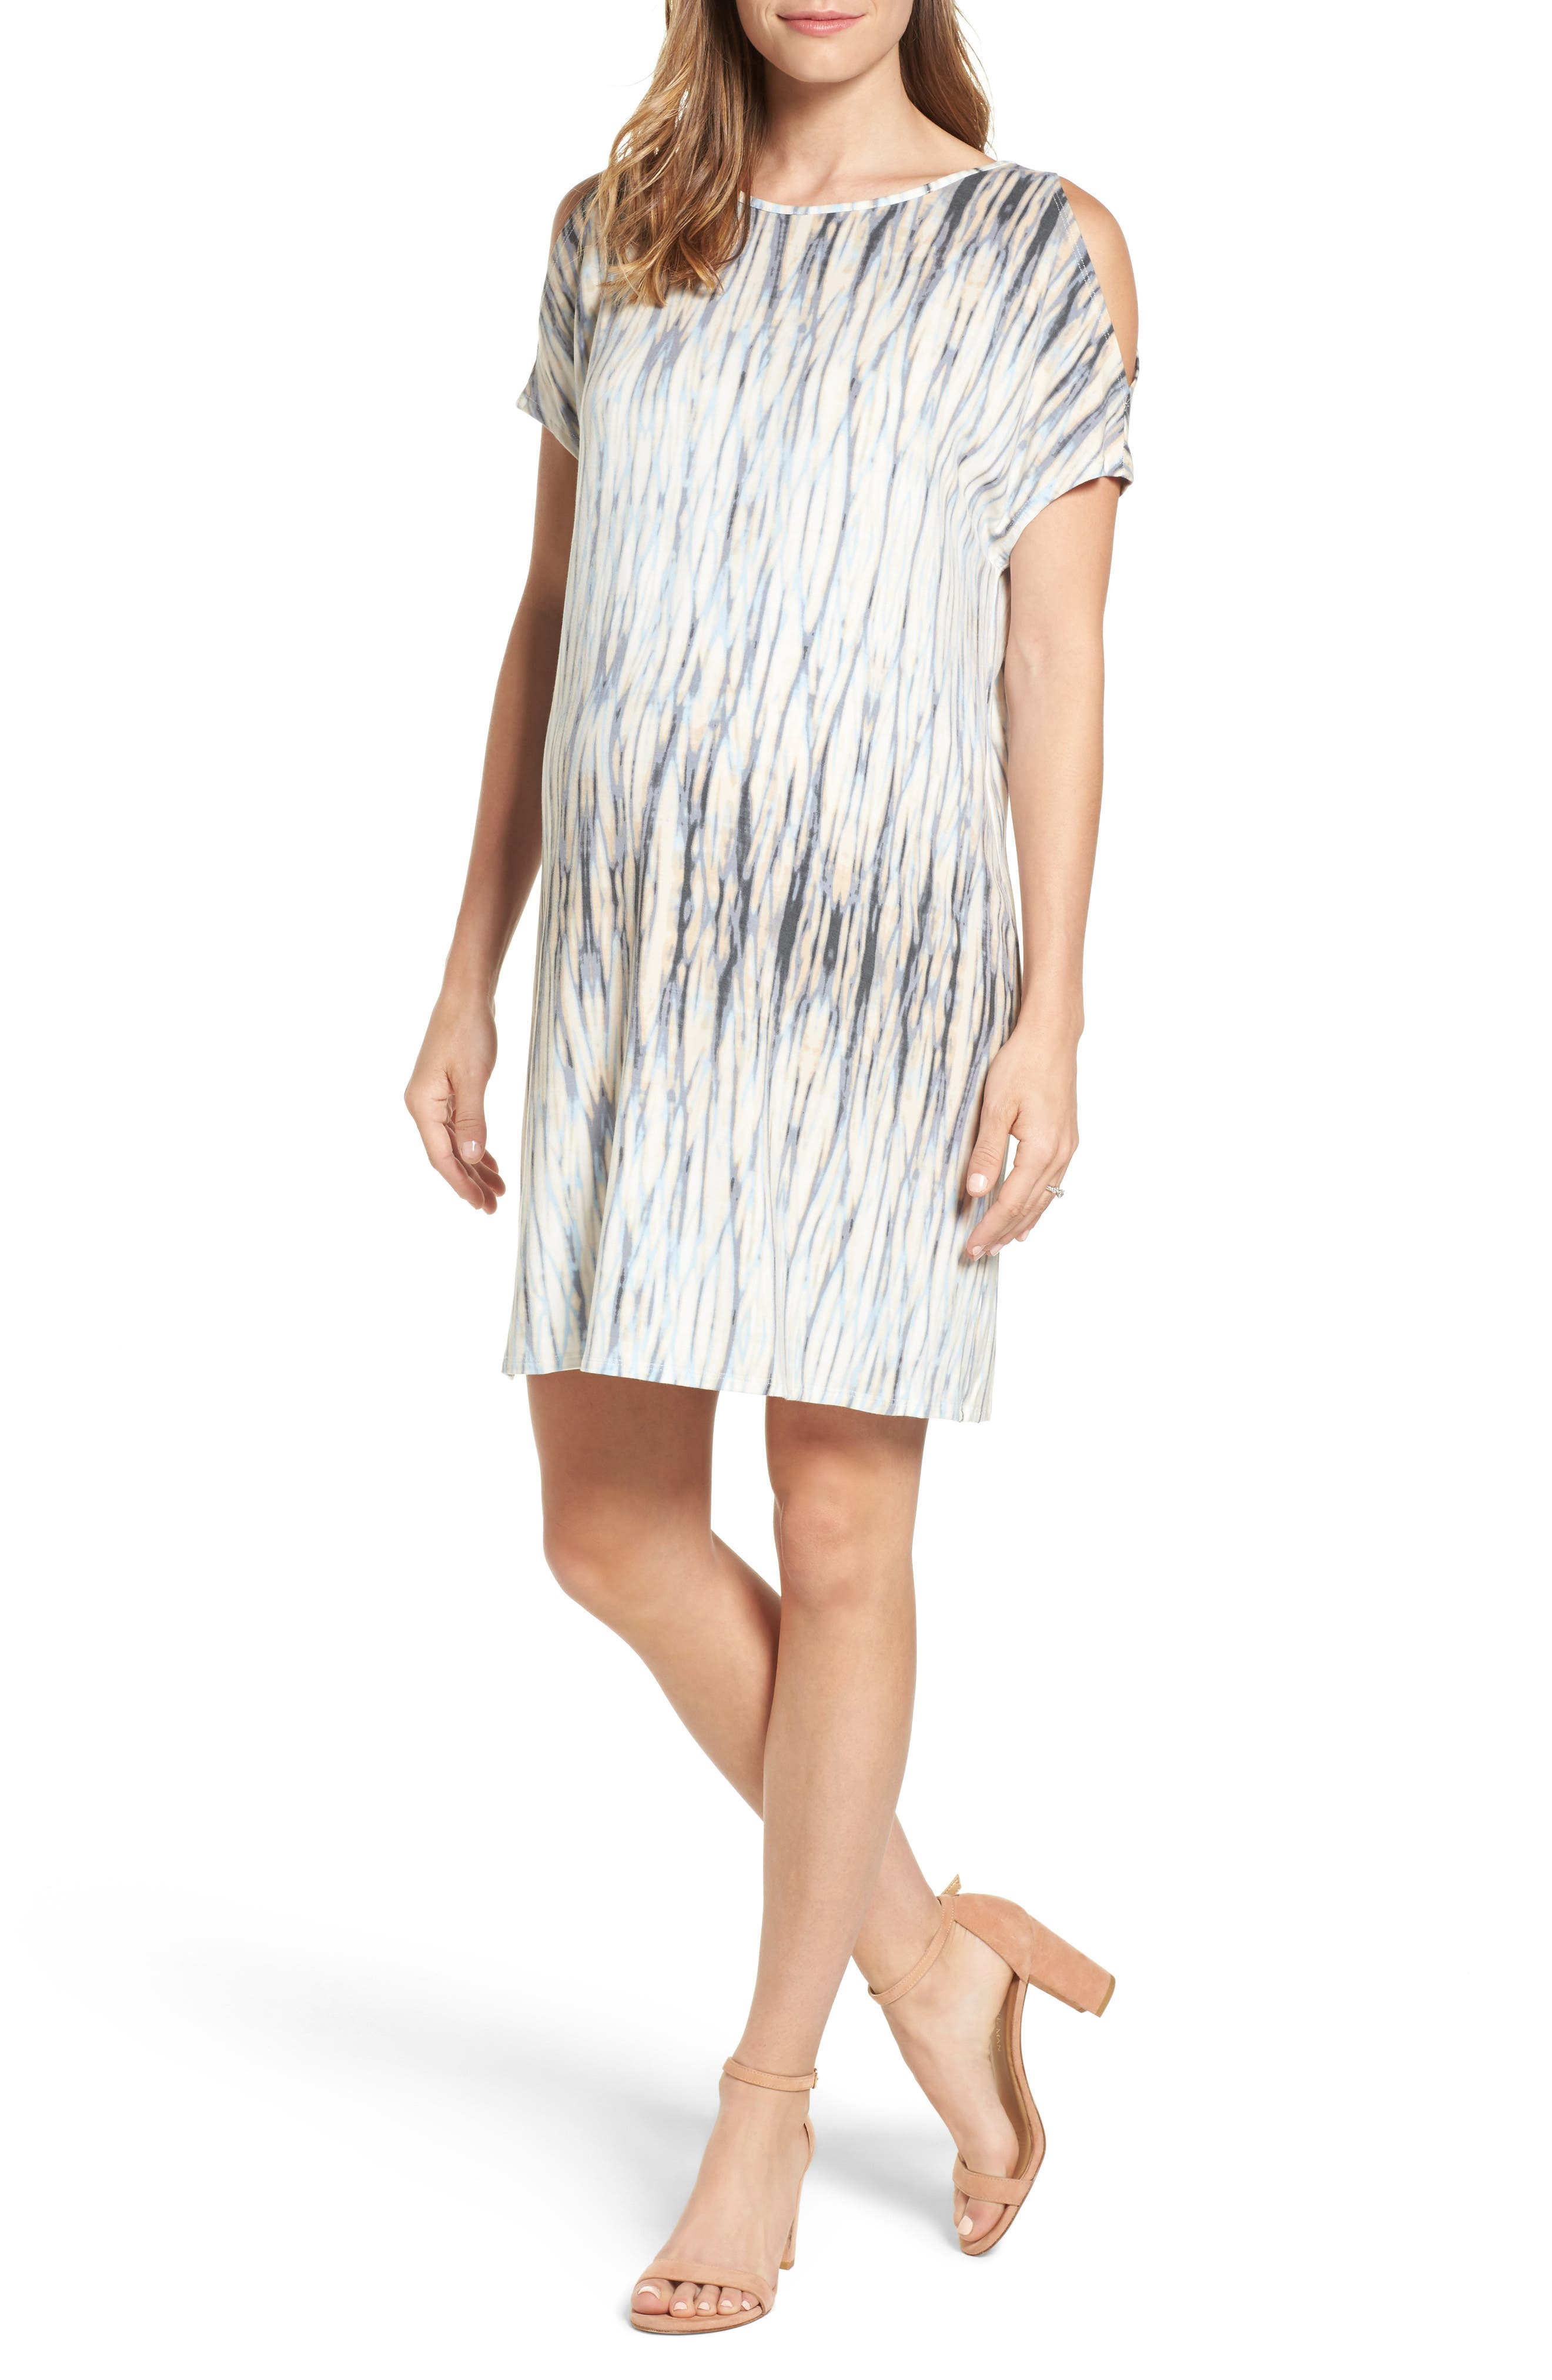 TART MATERNITY, Caia Cold Shoulder Maternity Dress, Main thumbnail 1, color, WATER REFLECTIONS